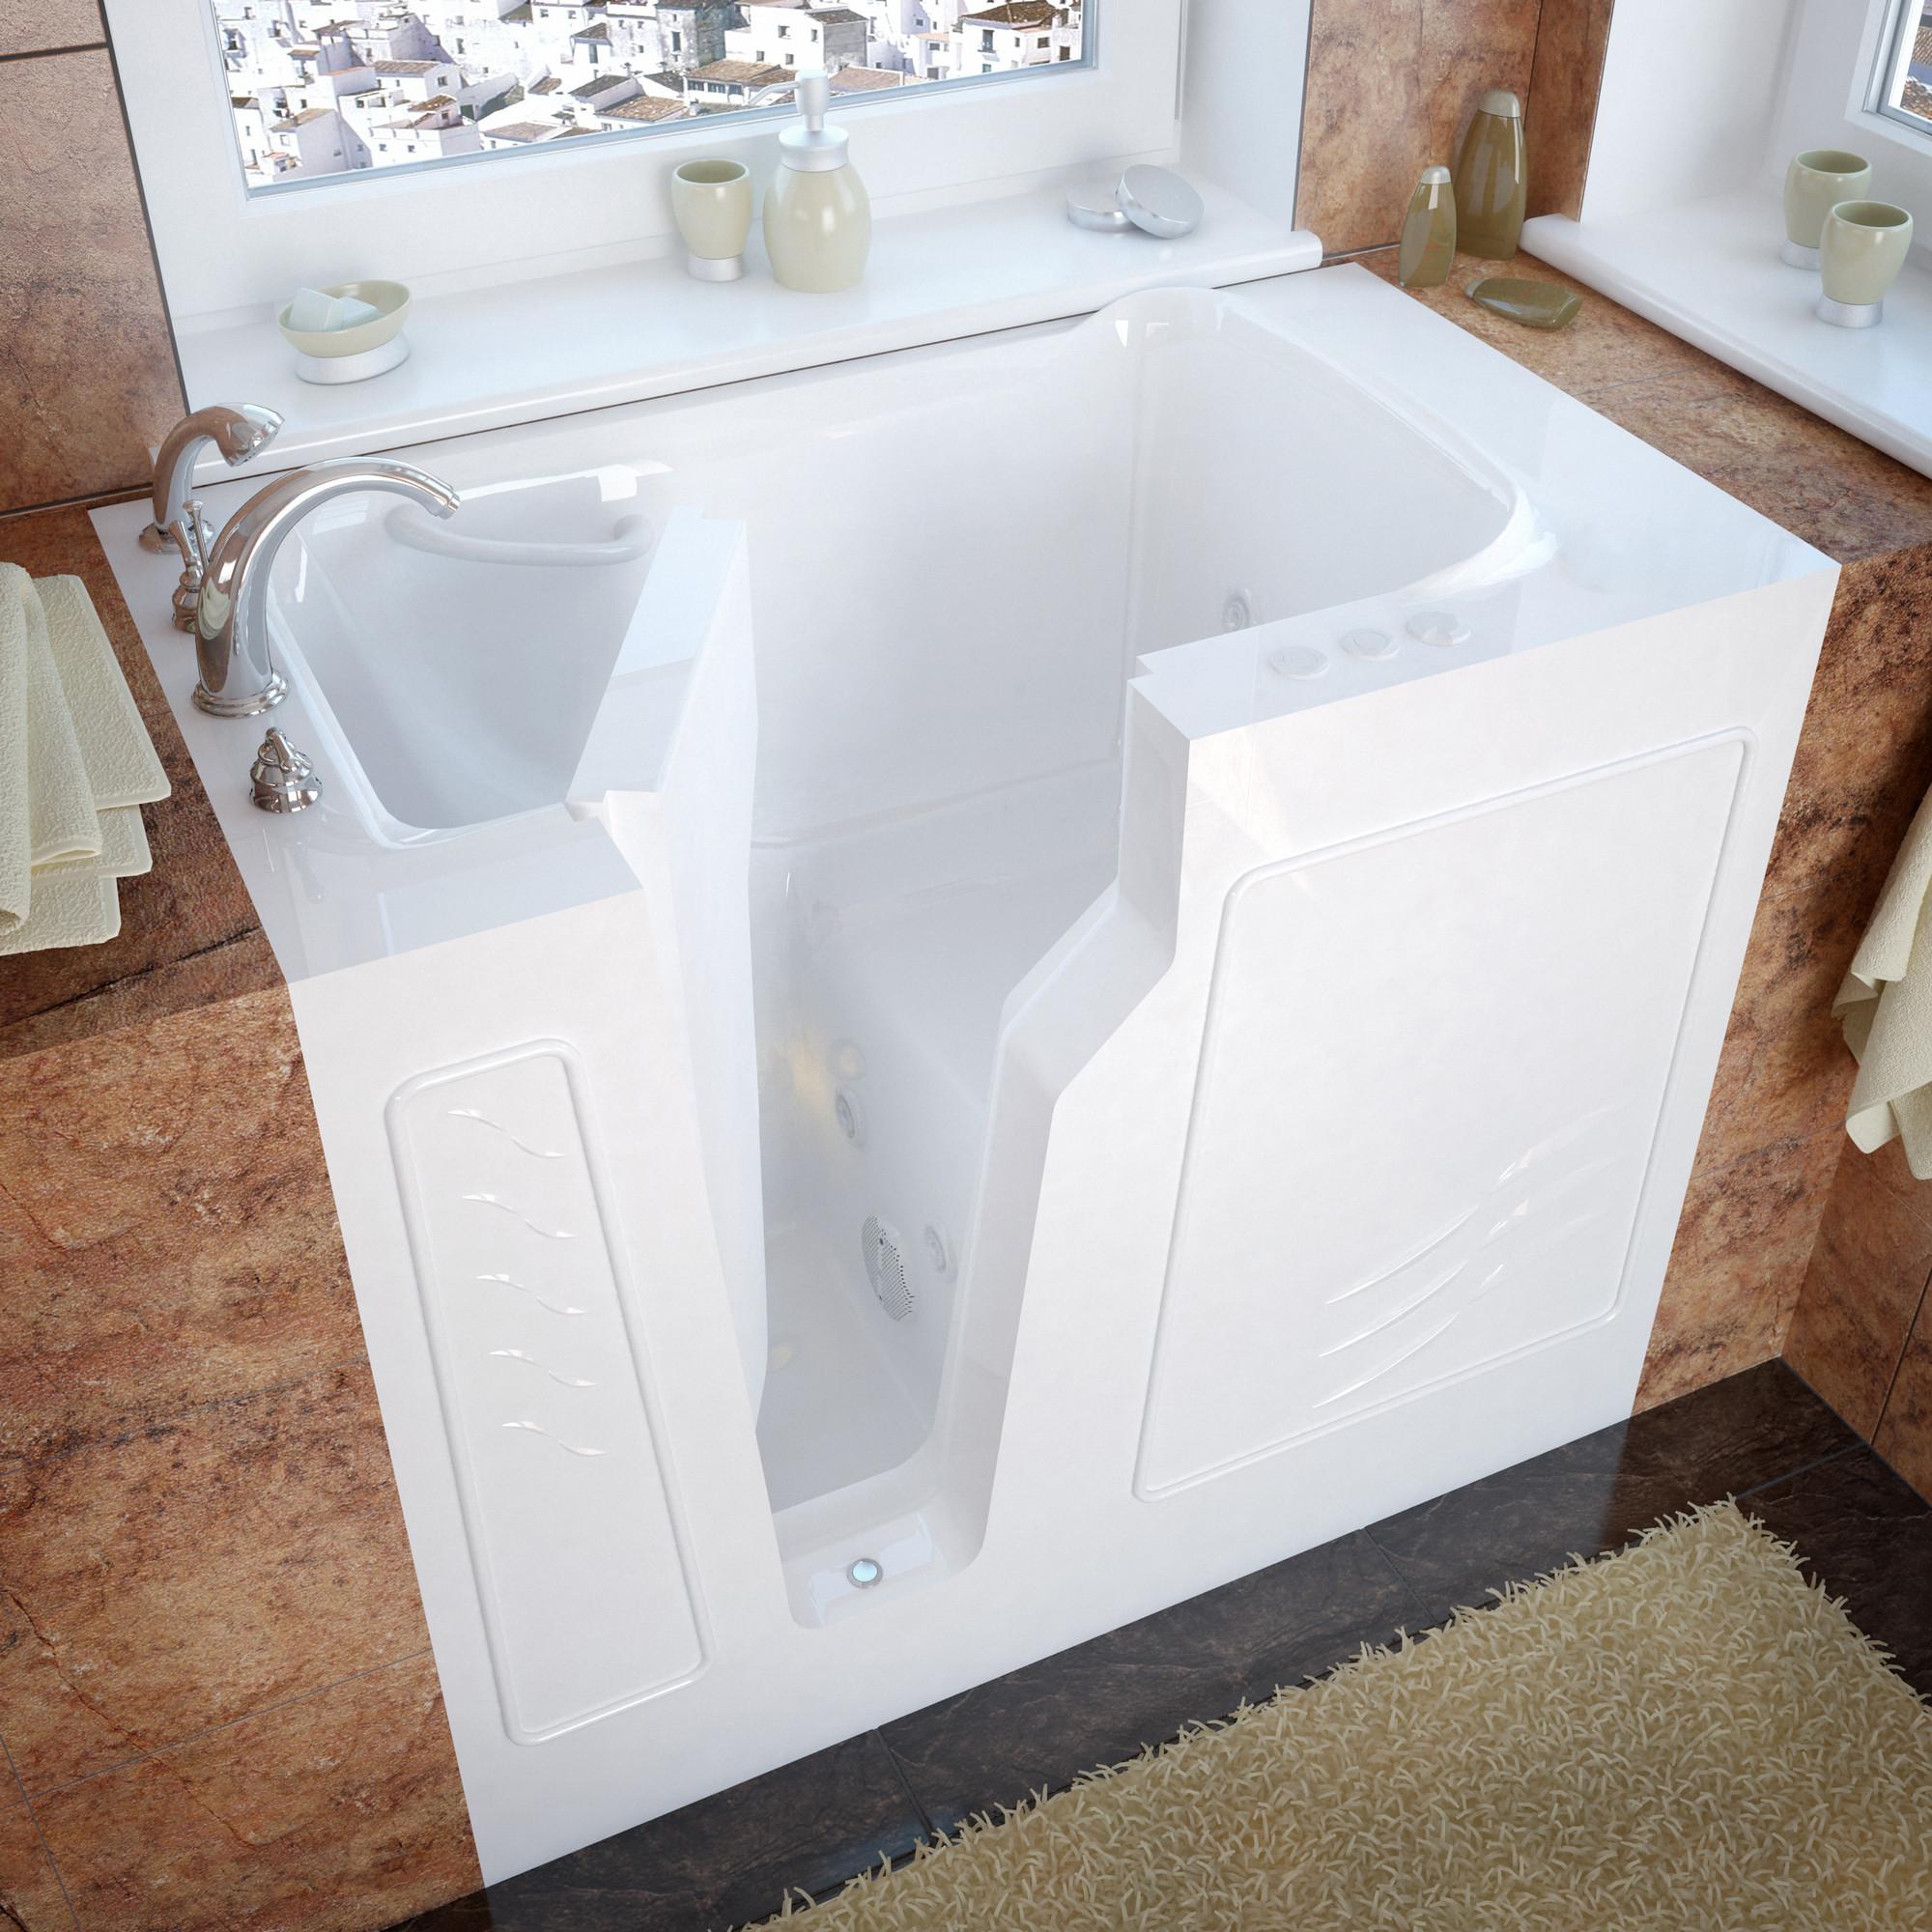 MediTub 2646LWH Walk-In 26 x 46 Left Drain White Whirlpool Jetted Bathtub